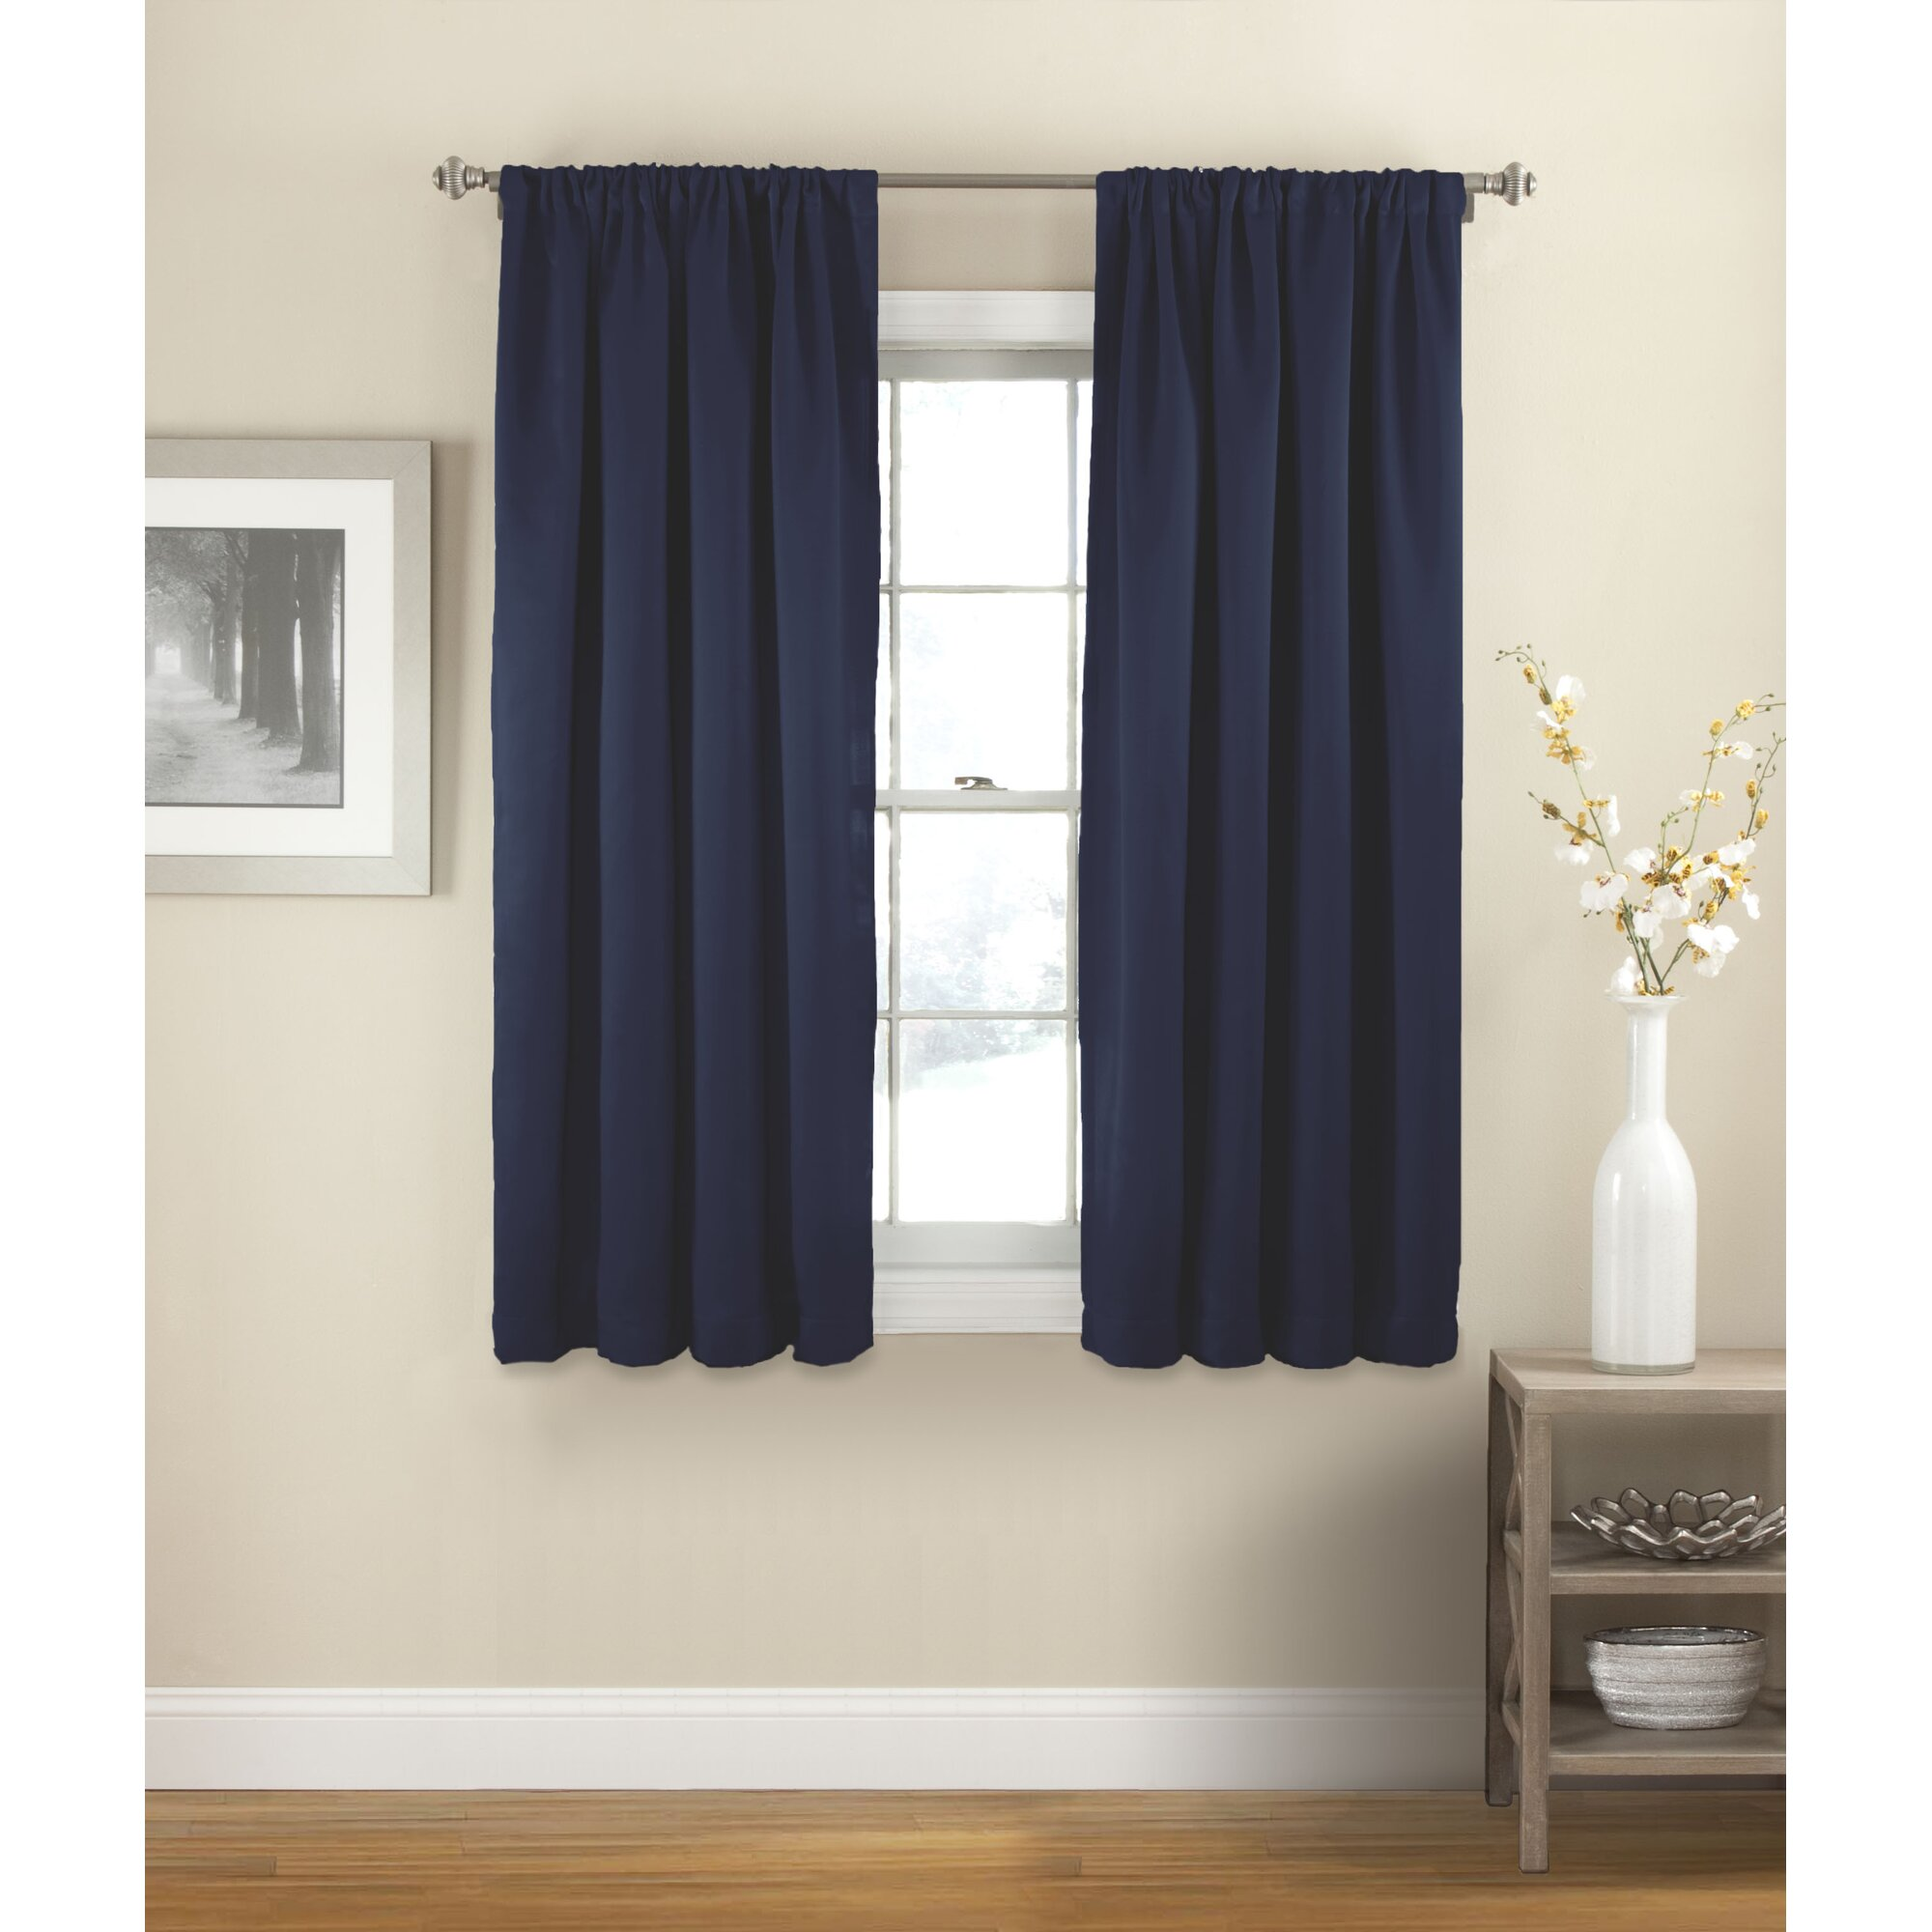 Short curtain rods for side panels - Vina Solid Room Darkening Thermal Rod Pocket Single Curtain Panel